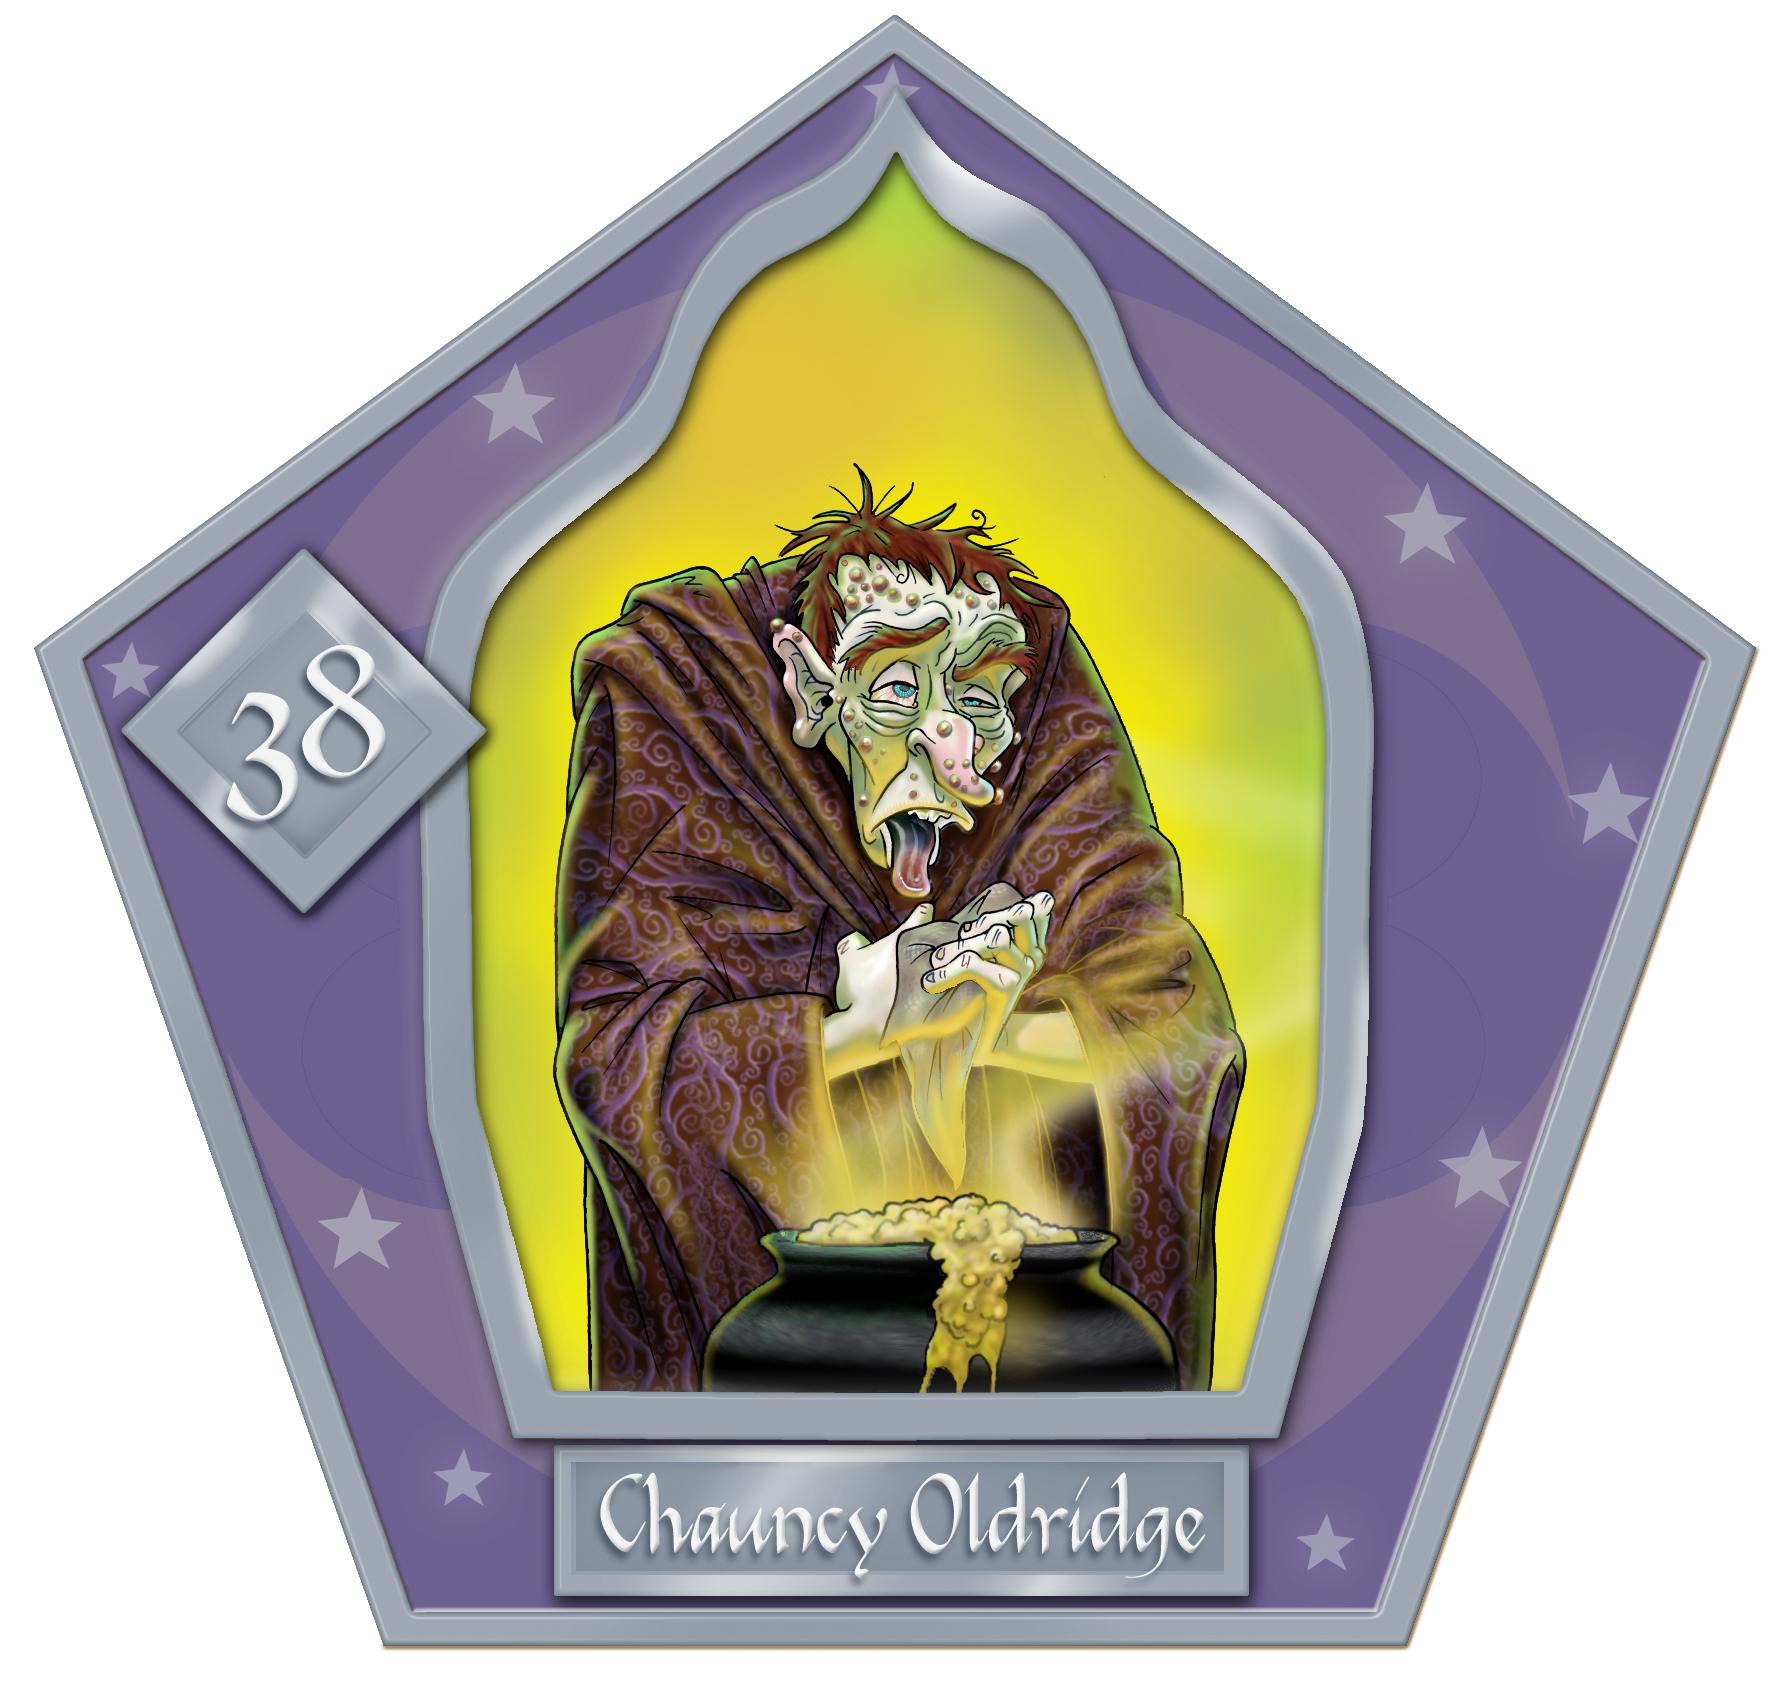 File:Chauncey Oldridge-38-chocFrogCard.png